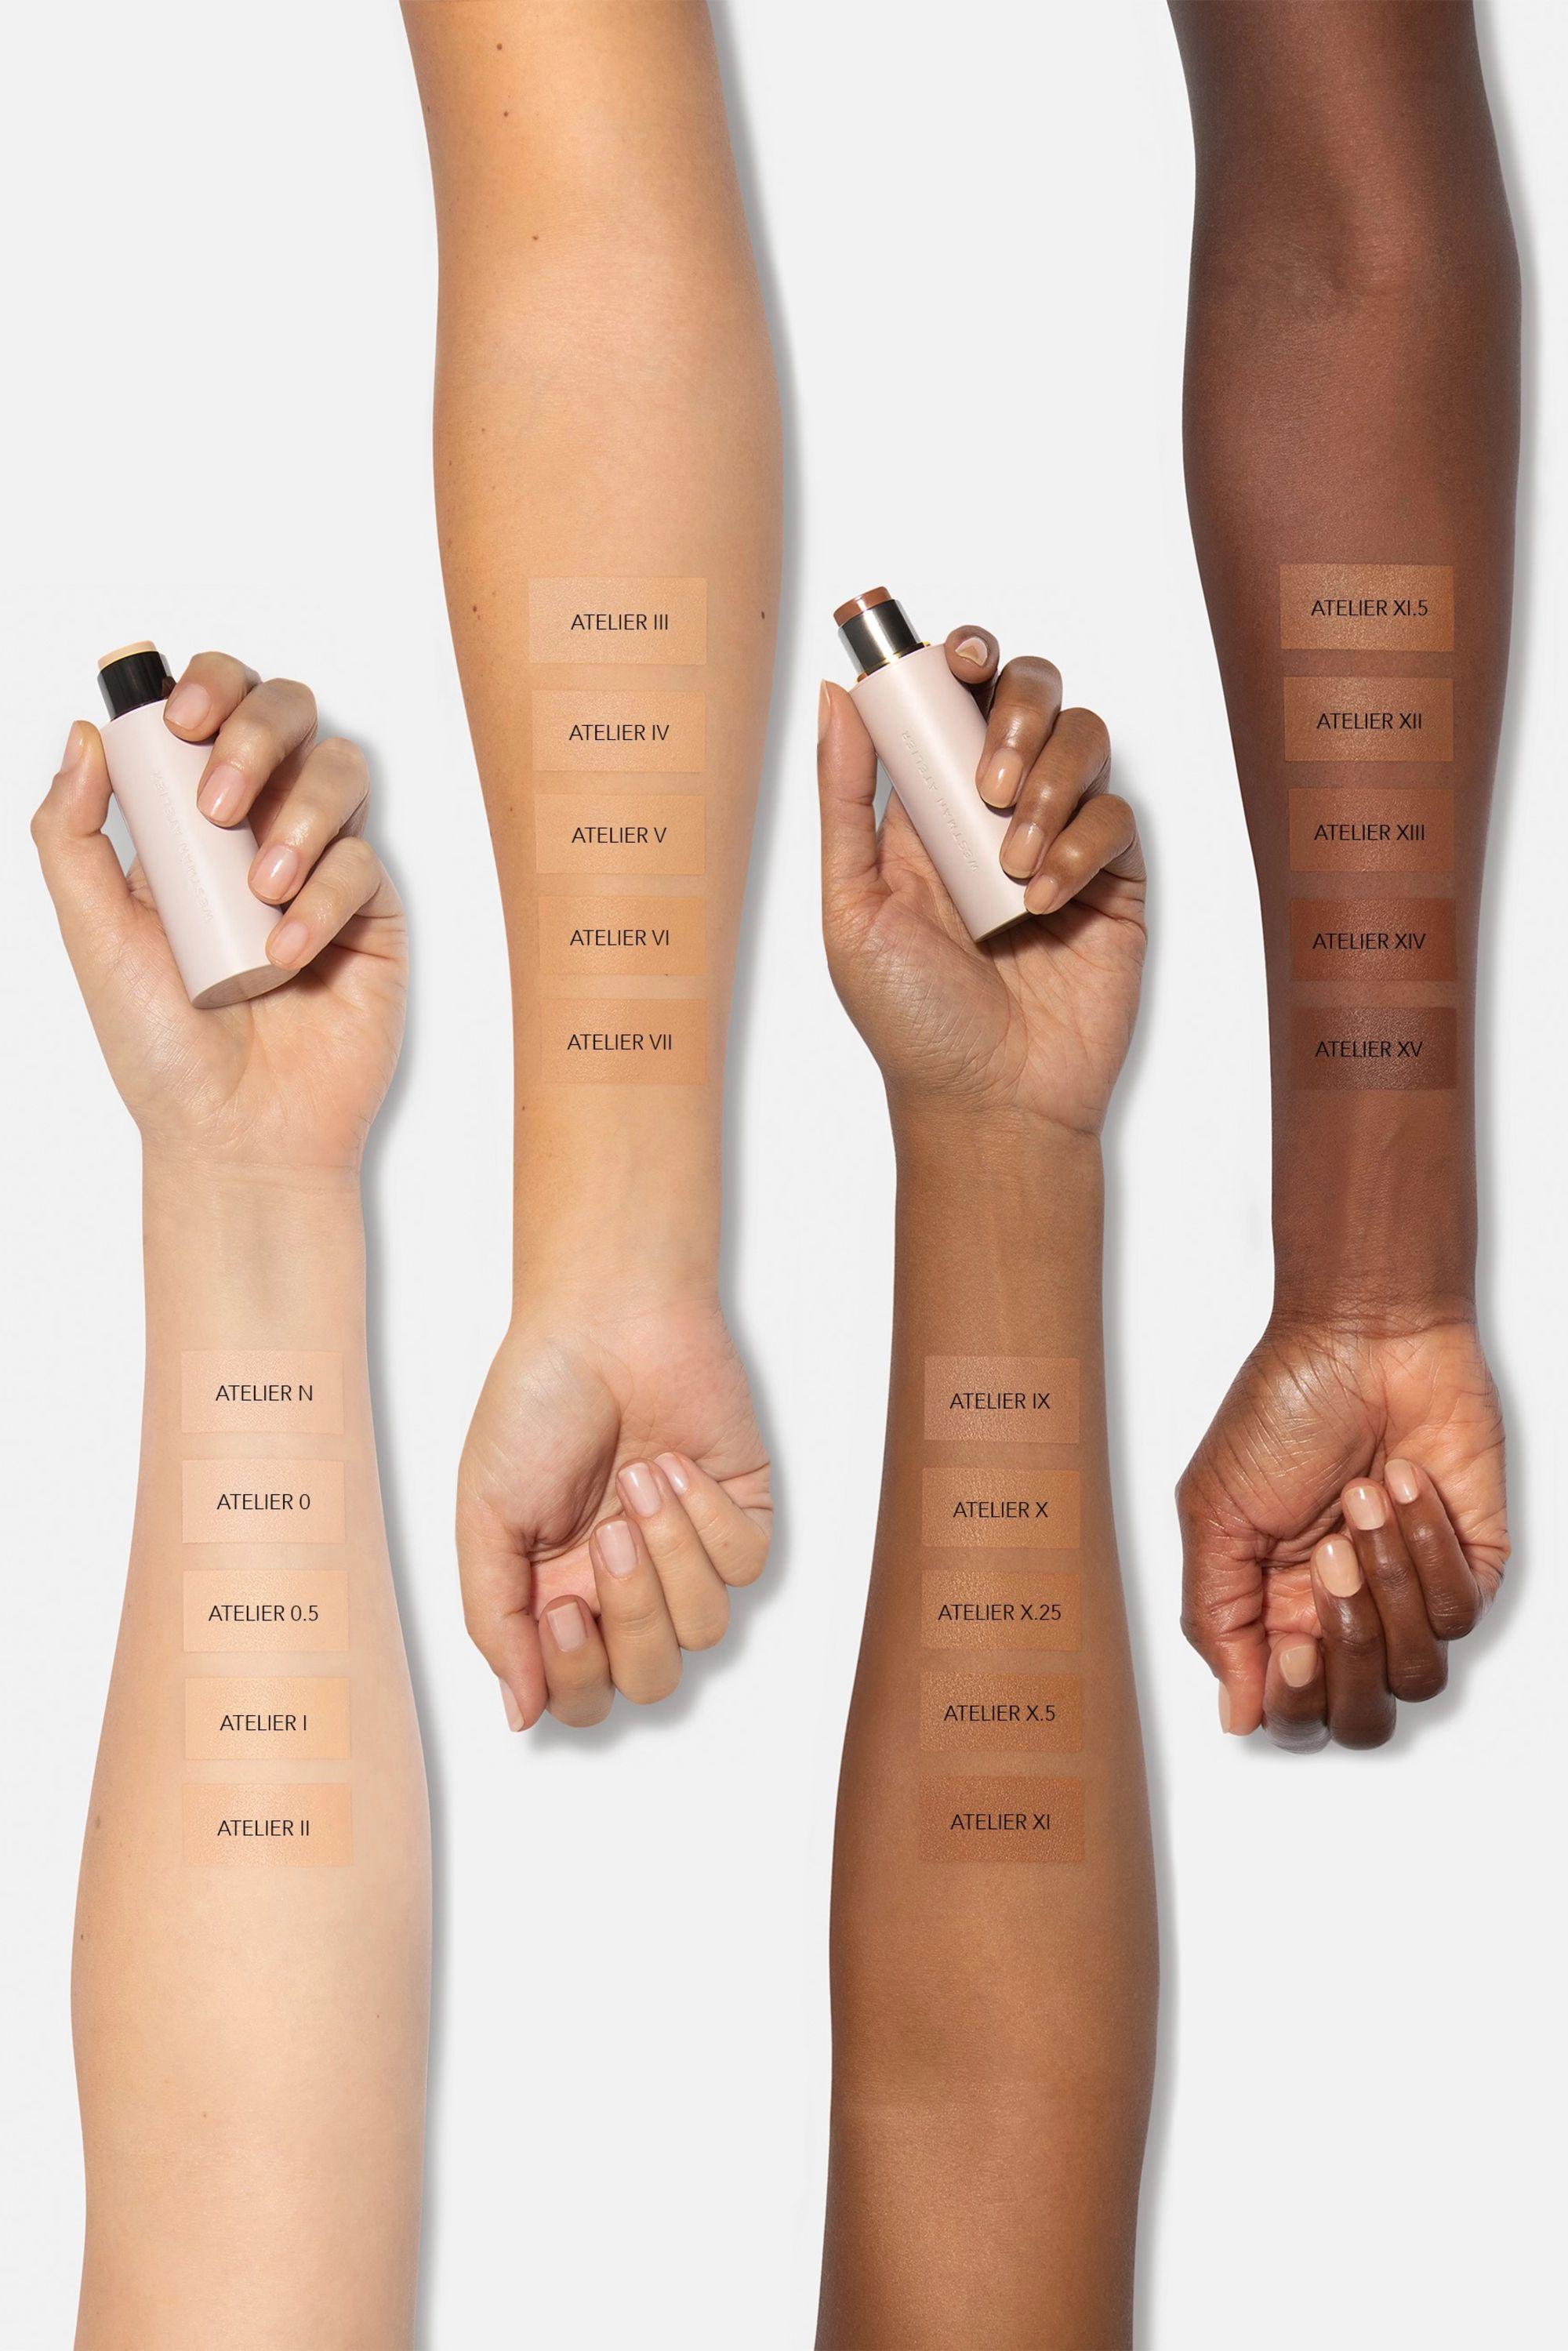 Westman Atelier Vital Skin Foundation Stick - Atelier VIII, 9g